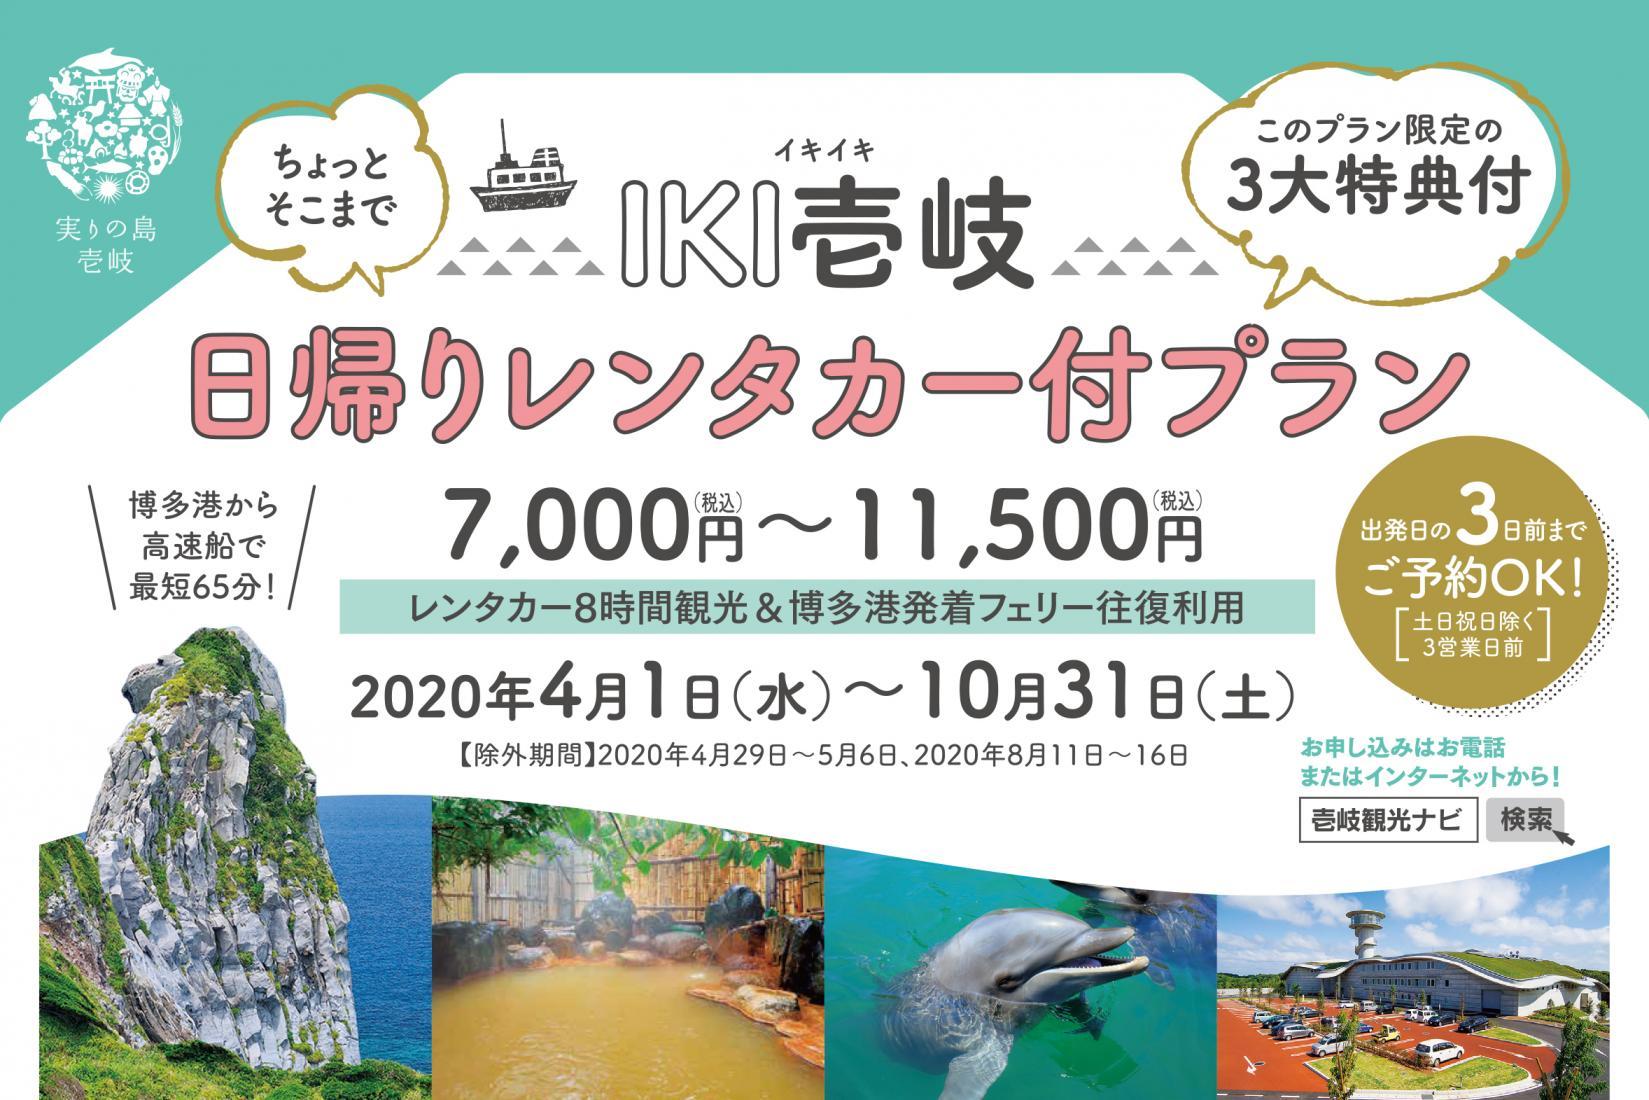 IKI壱岐日帰りレンタカー付プラン-1